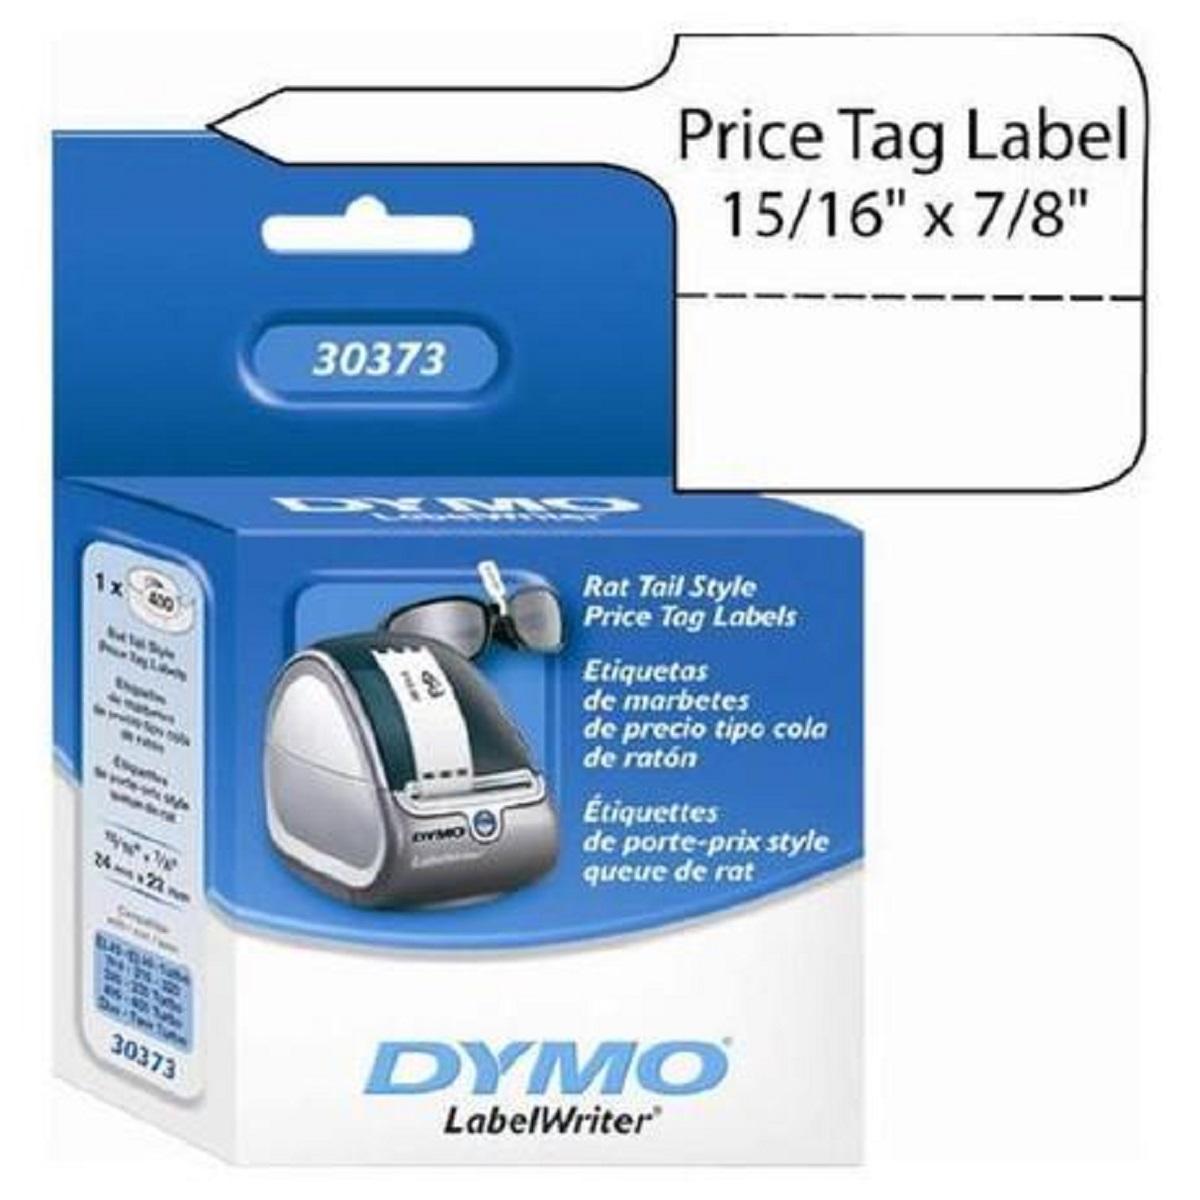 Etiqueta Para Bijuterias Joias Labelwriter Dymo 23mmx51mm 30373